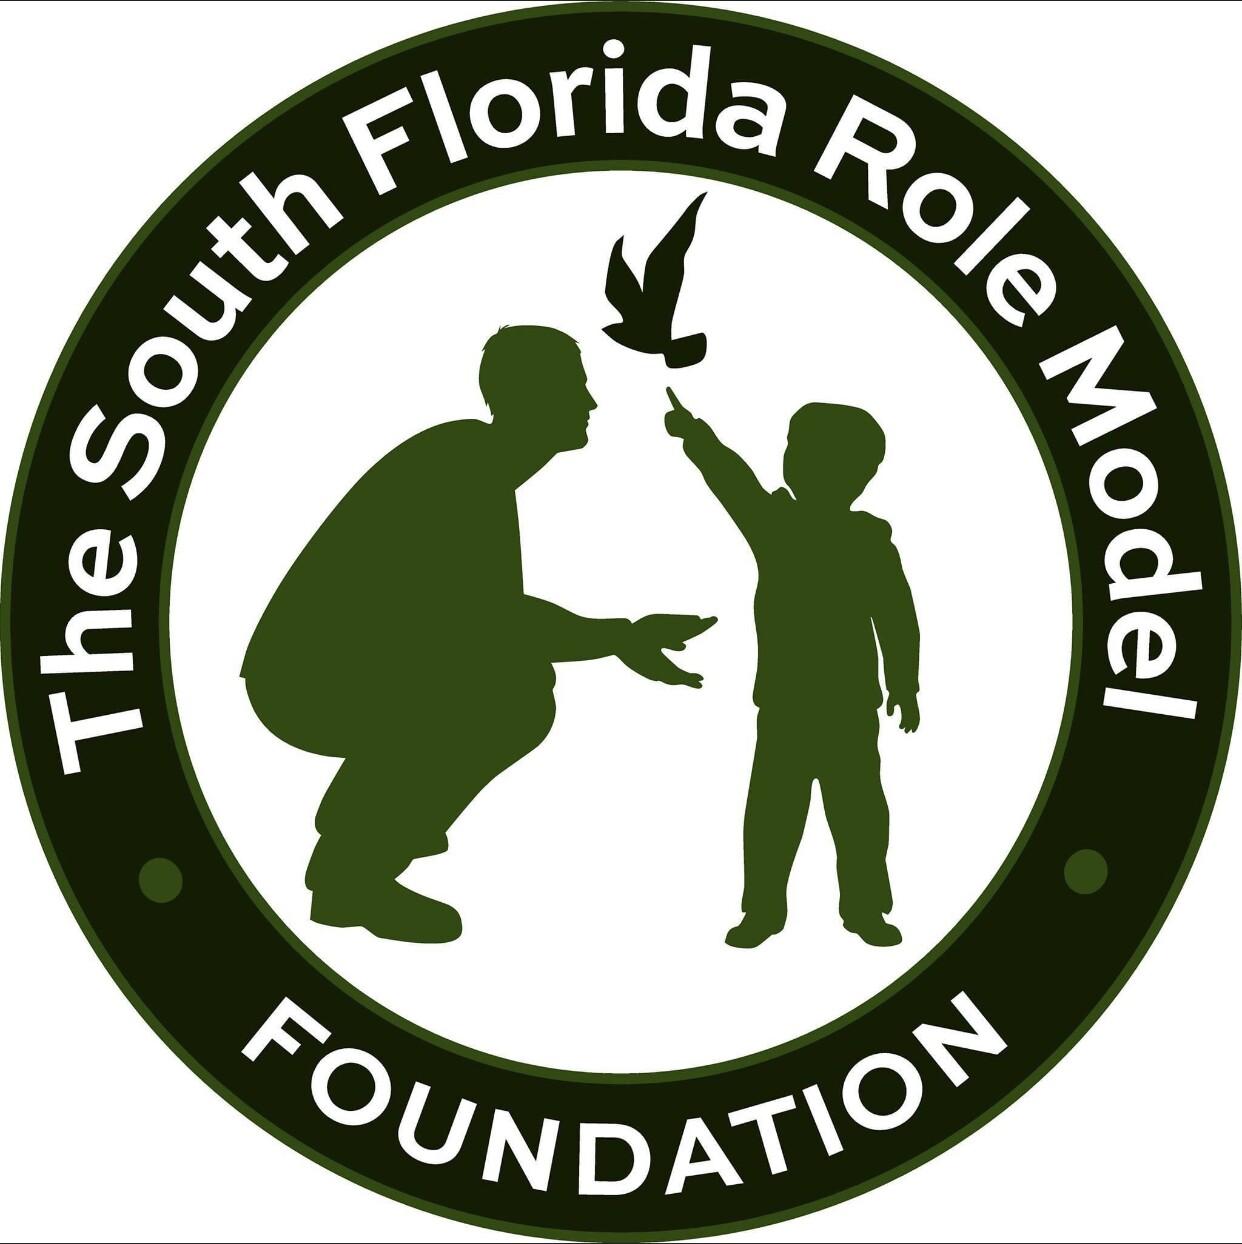 South Florida Role Models Foundation logo